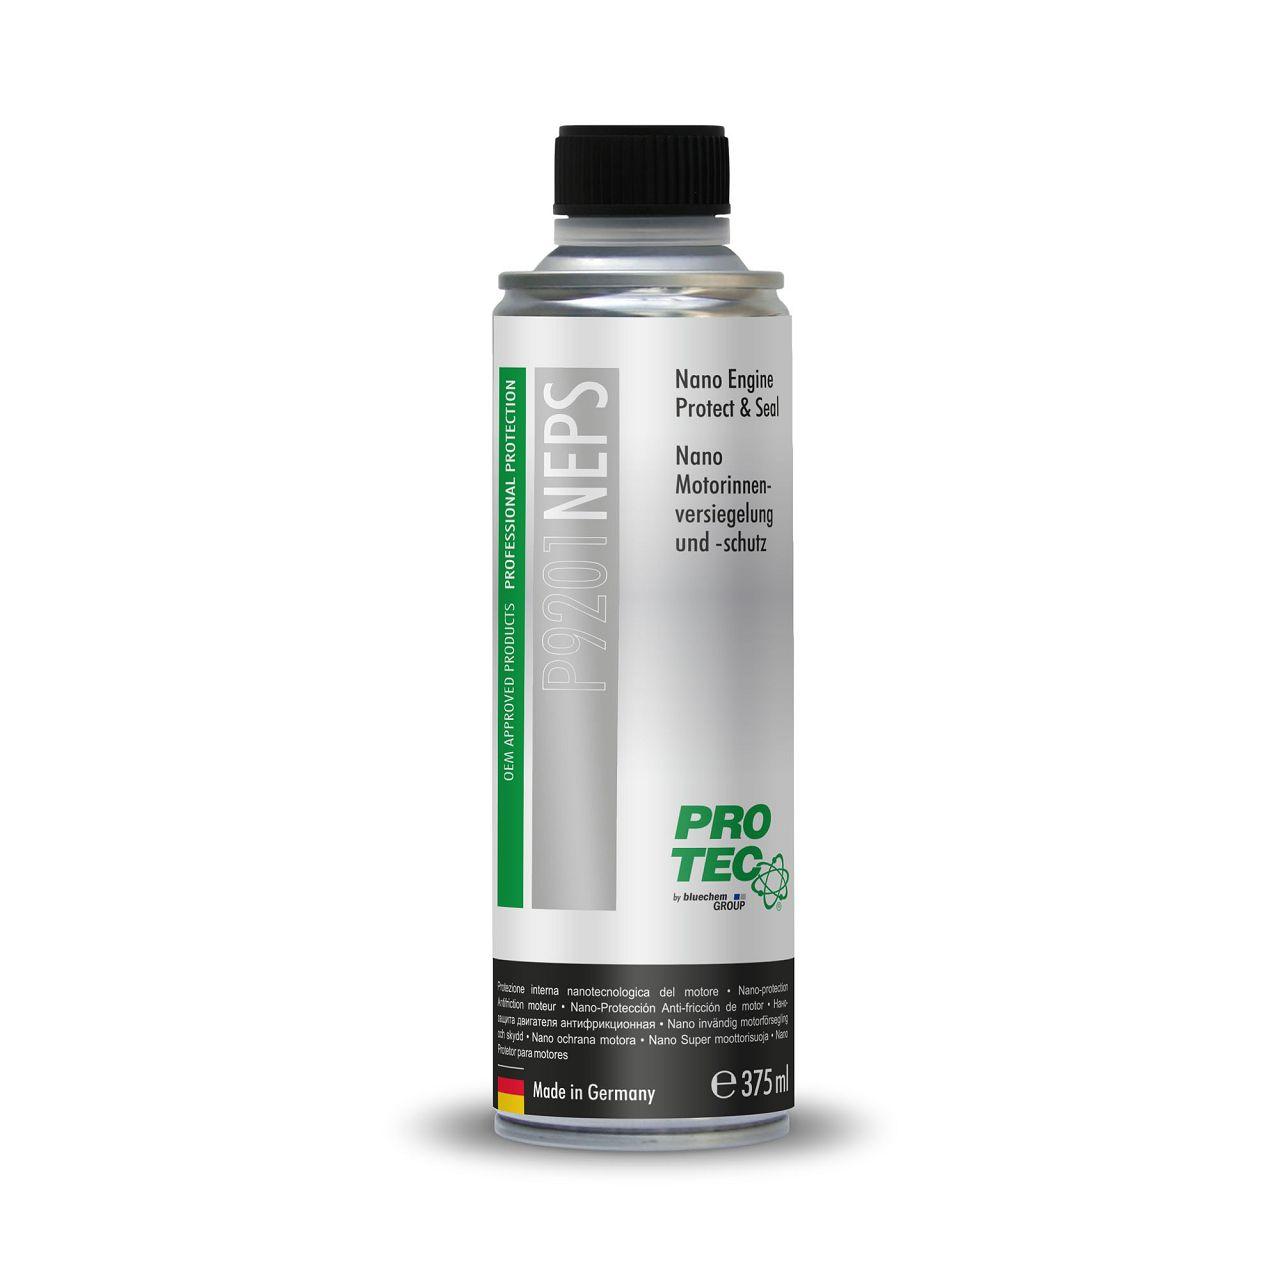 PROTEC NEPS Engine Protect & Seal Nano Motorinnenversiegelung & Schutz 375ml